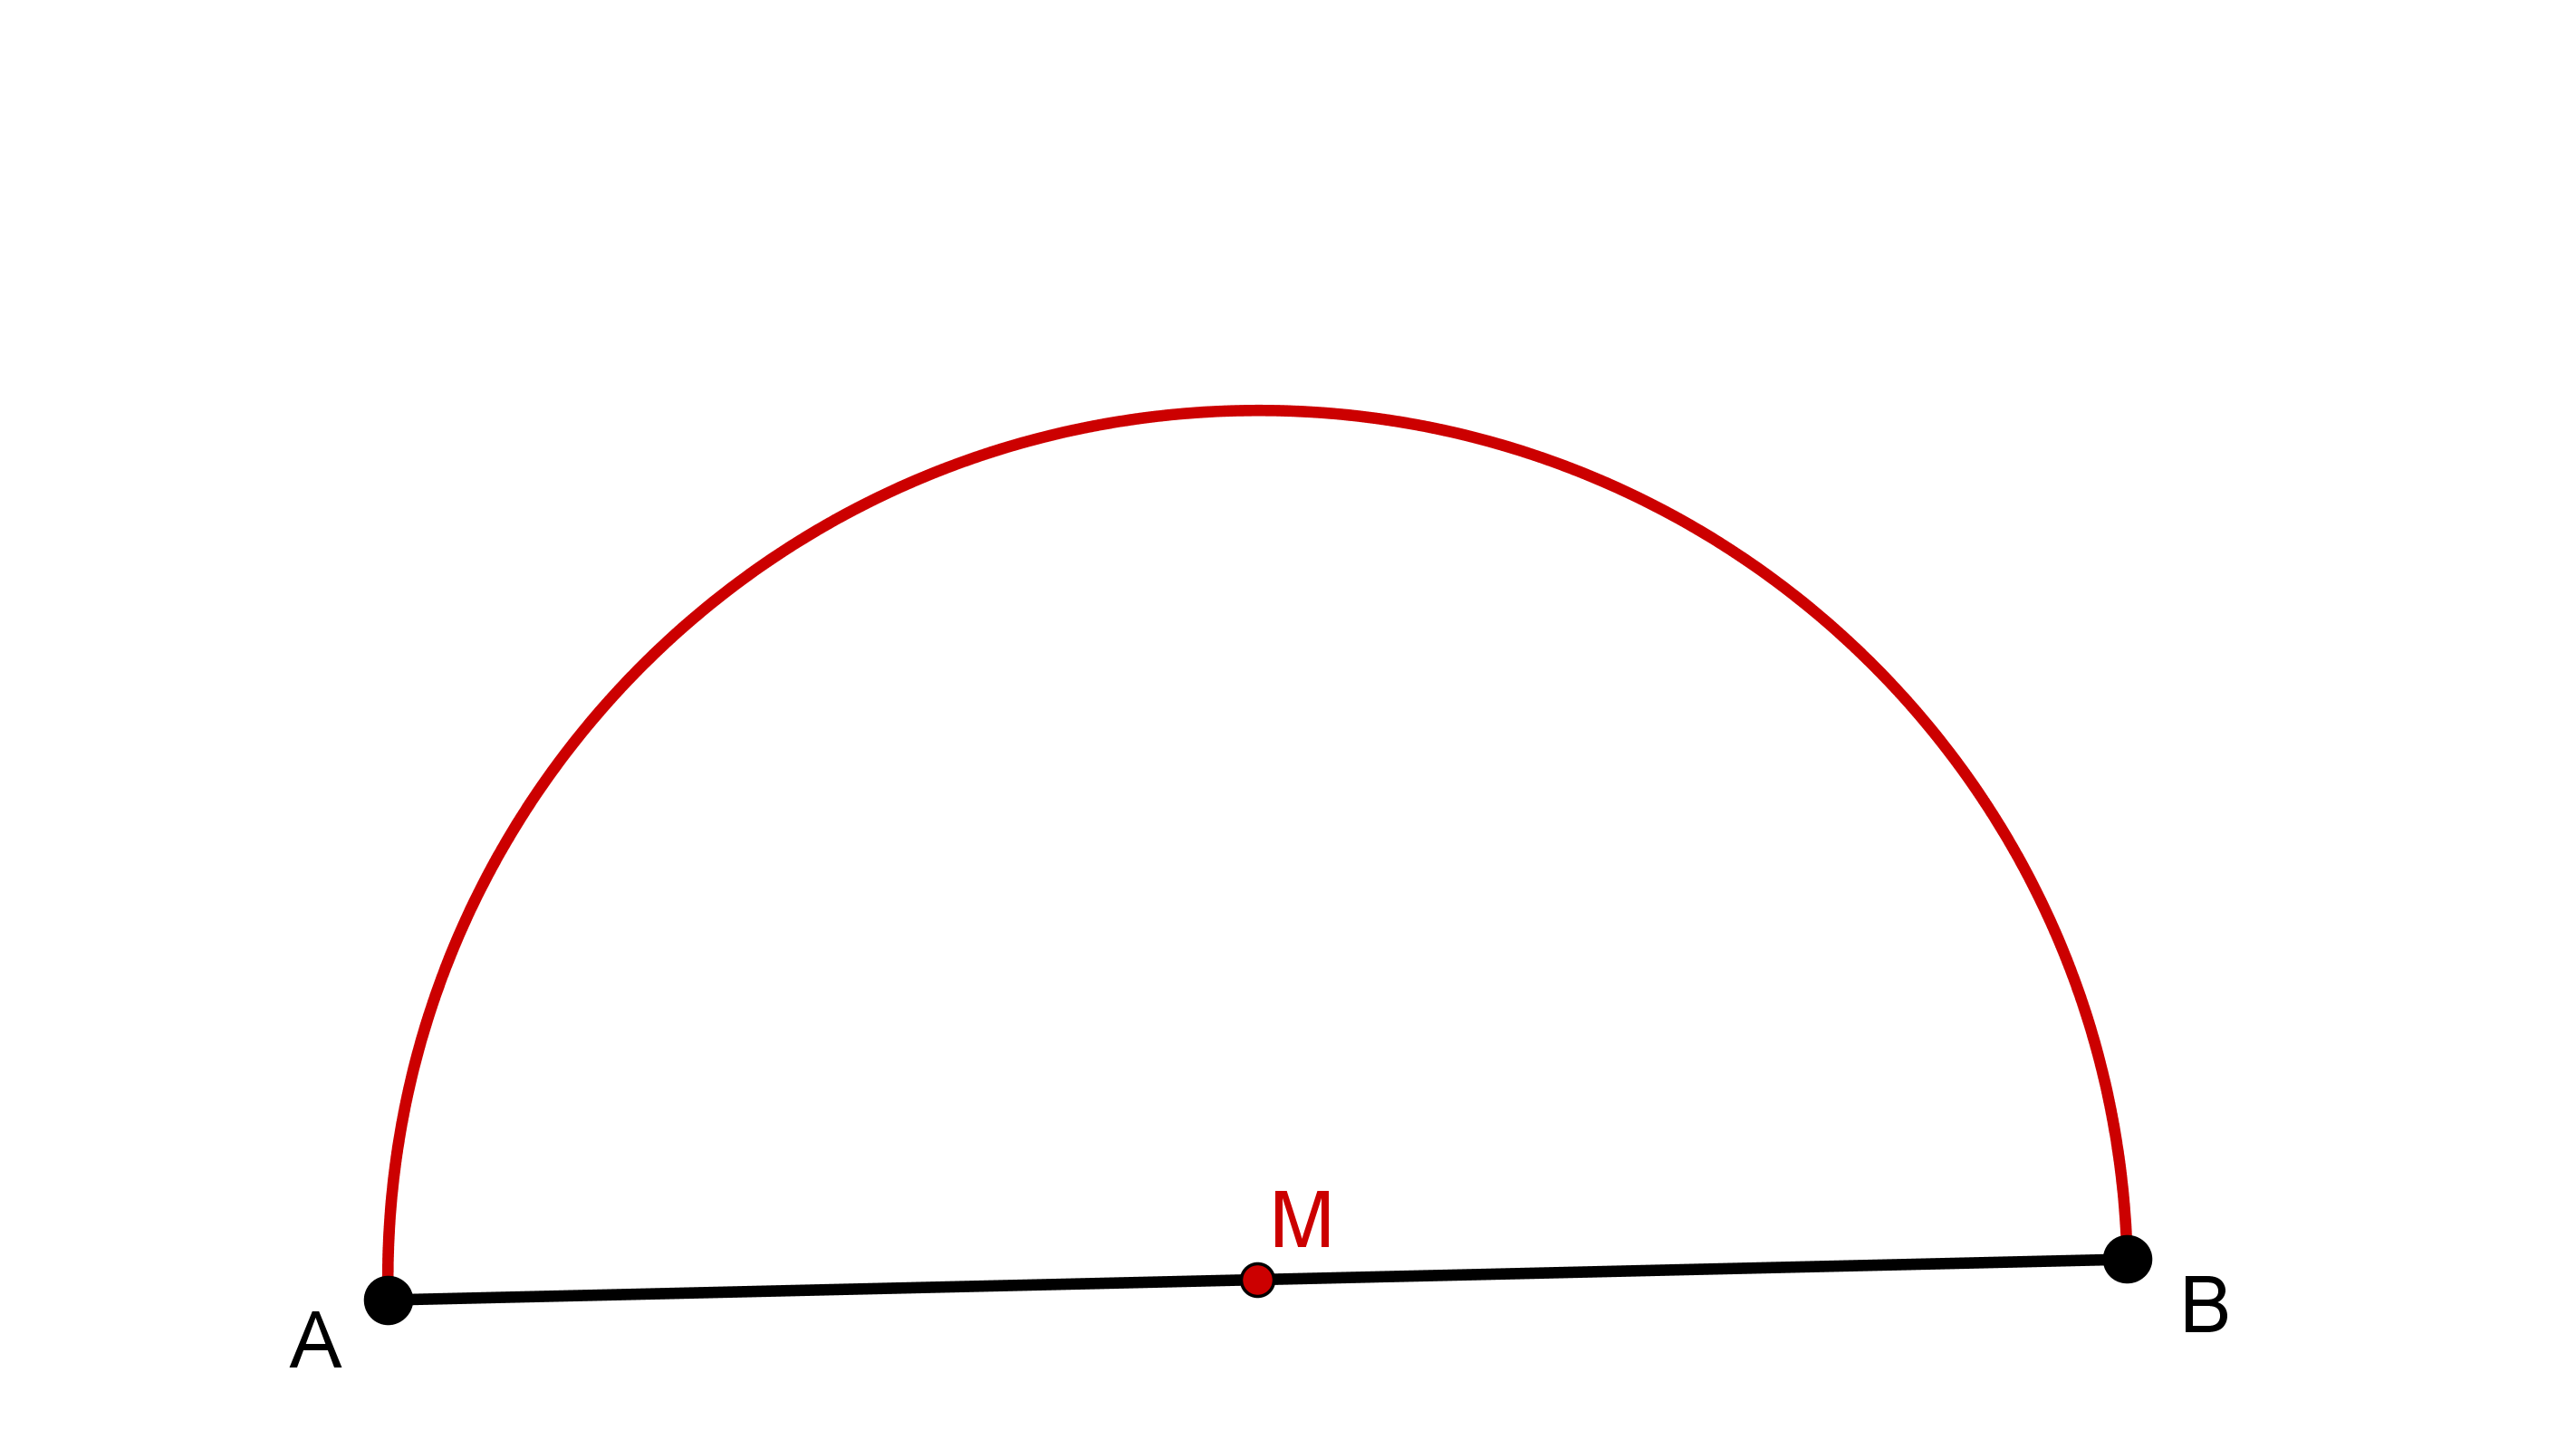 tangente kreis berechnen rechner kreis matheretter konstruktion der tangente an einen kreis. Black Bedroom Furniture Sets. Home Design Ideas